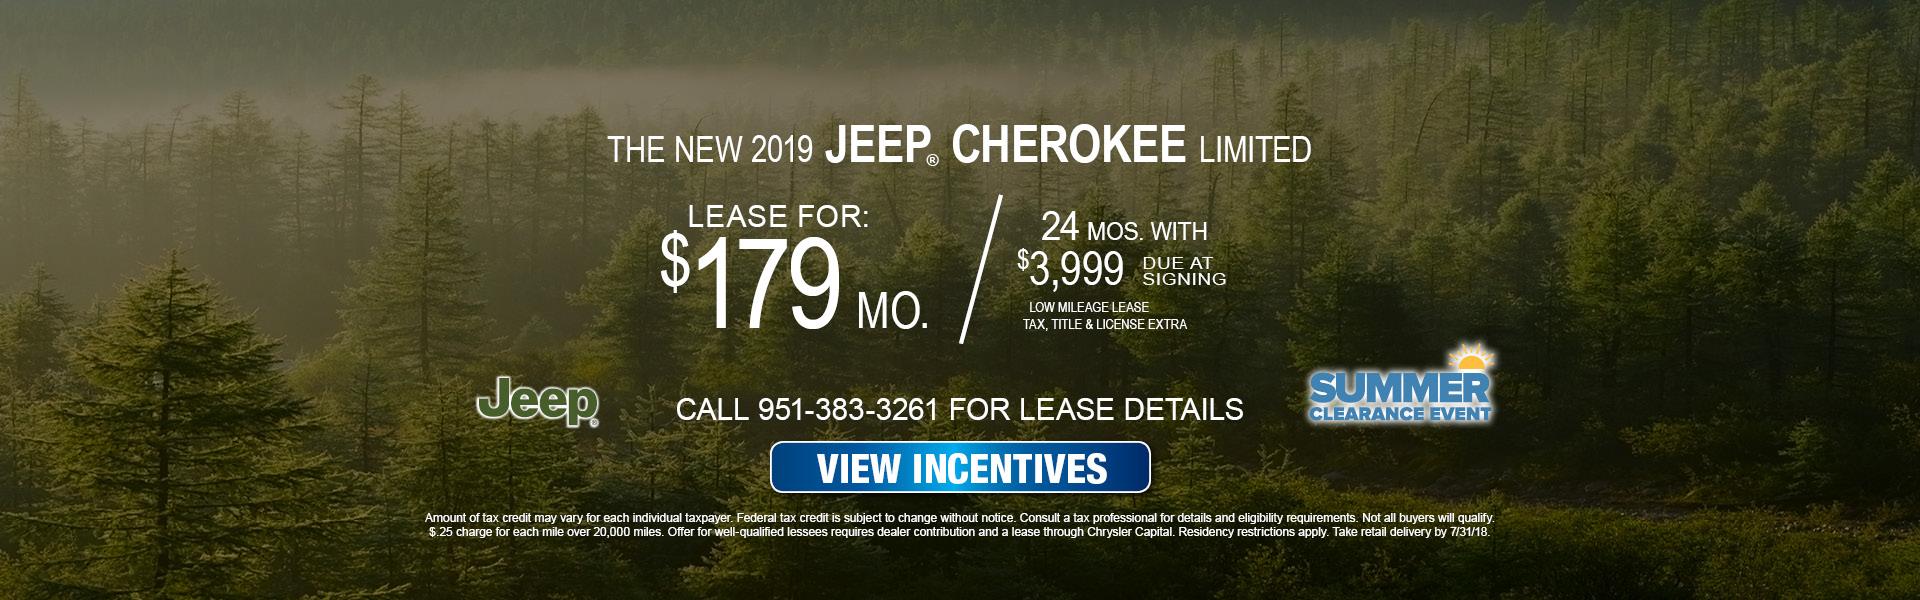 Jeep Cherokee $179 Lease